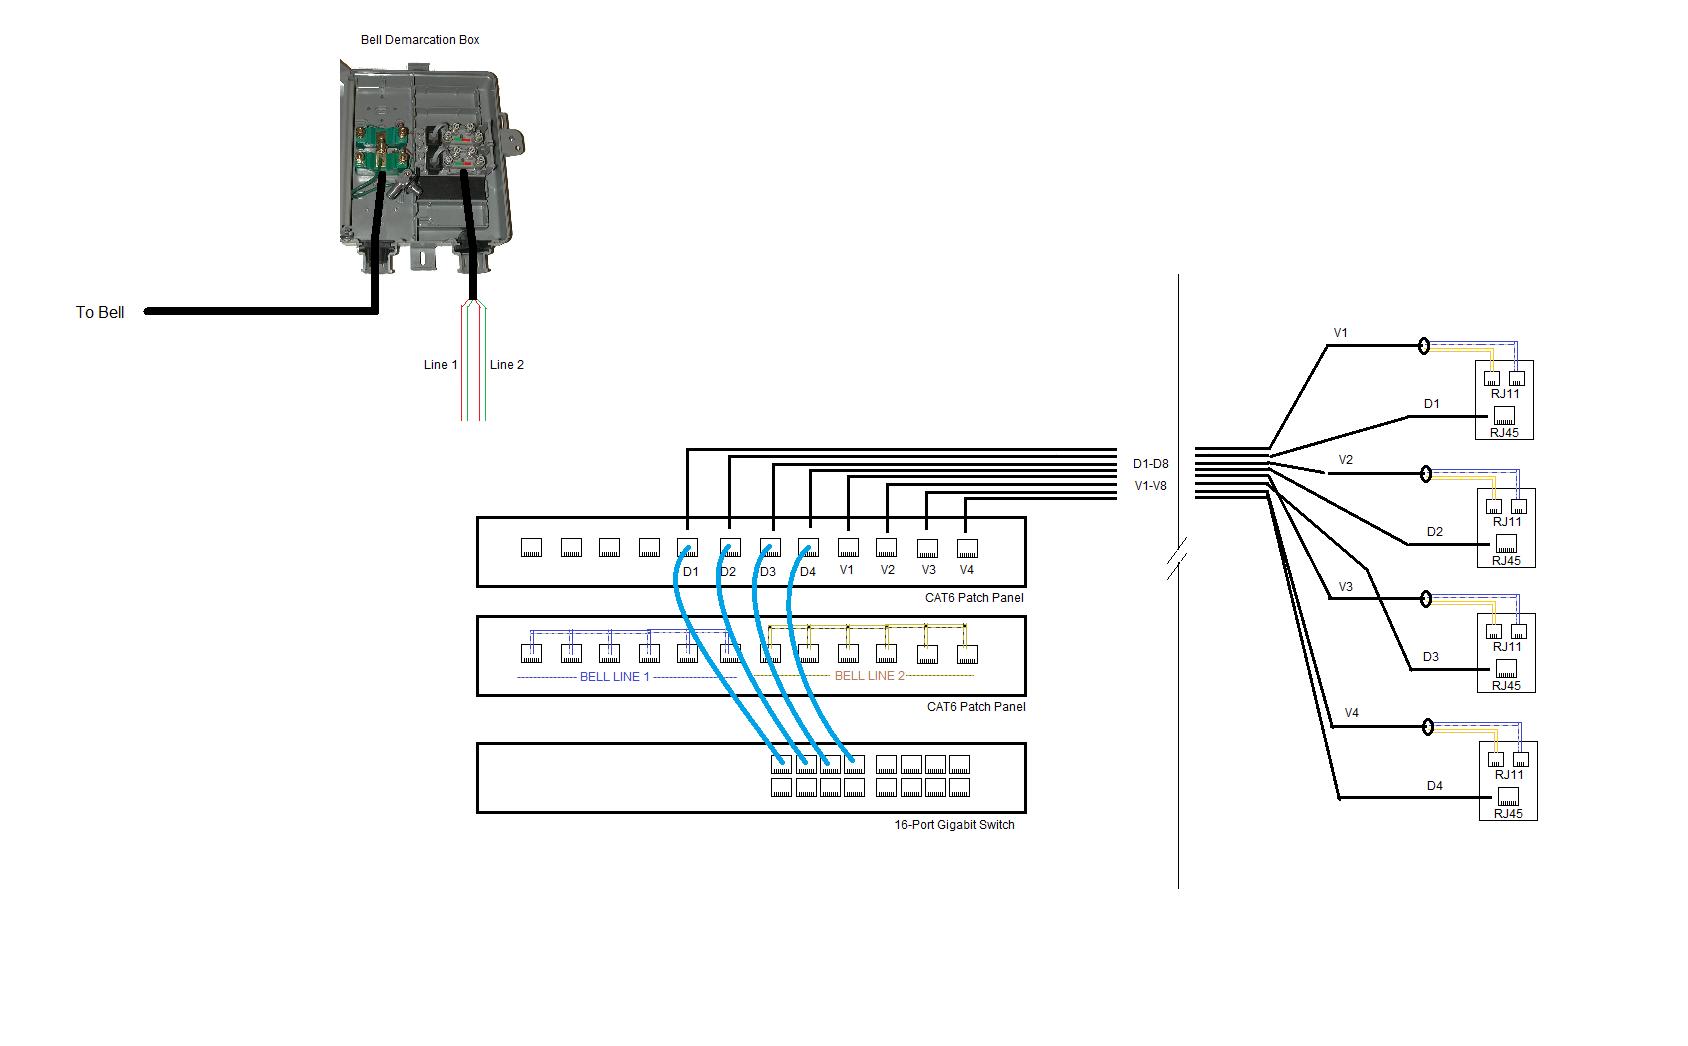 fiber optic patch panel wiring diagrams fiber optic patch panel wiring diagrams main cetar espressotage de  fiber optic patch panel wiring diagrams